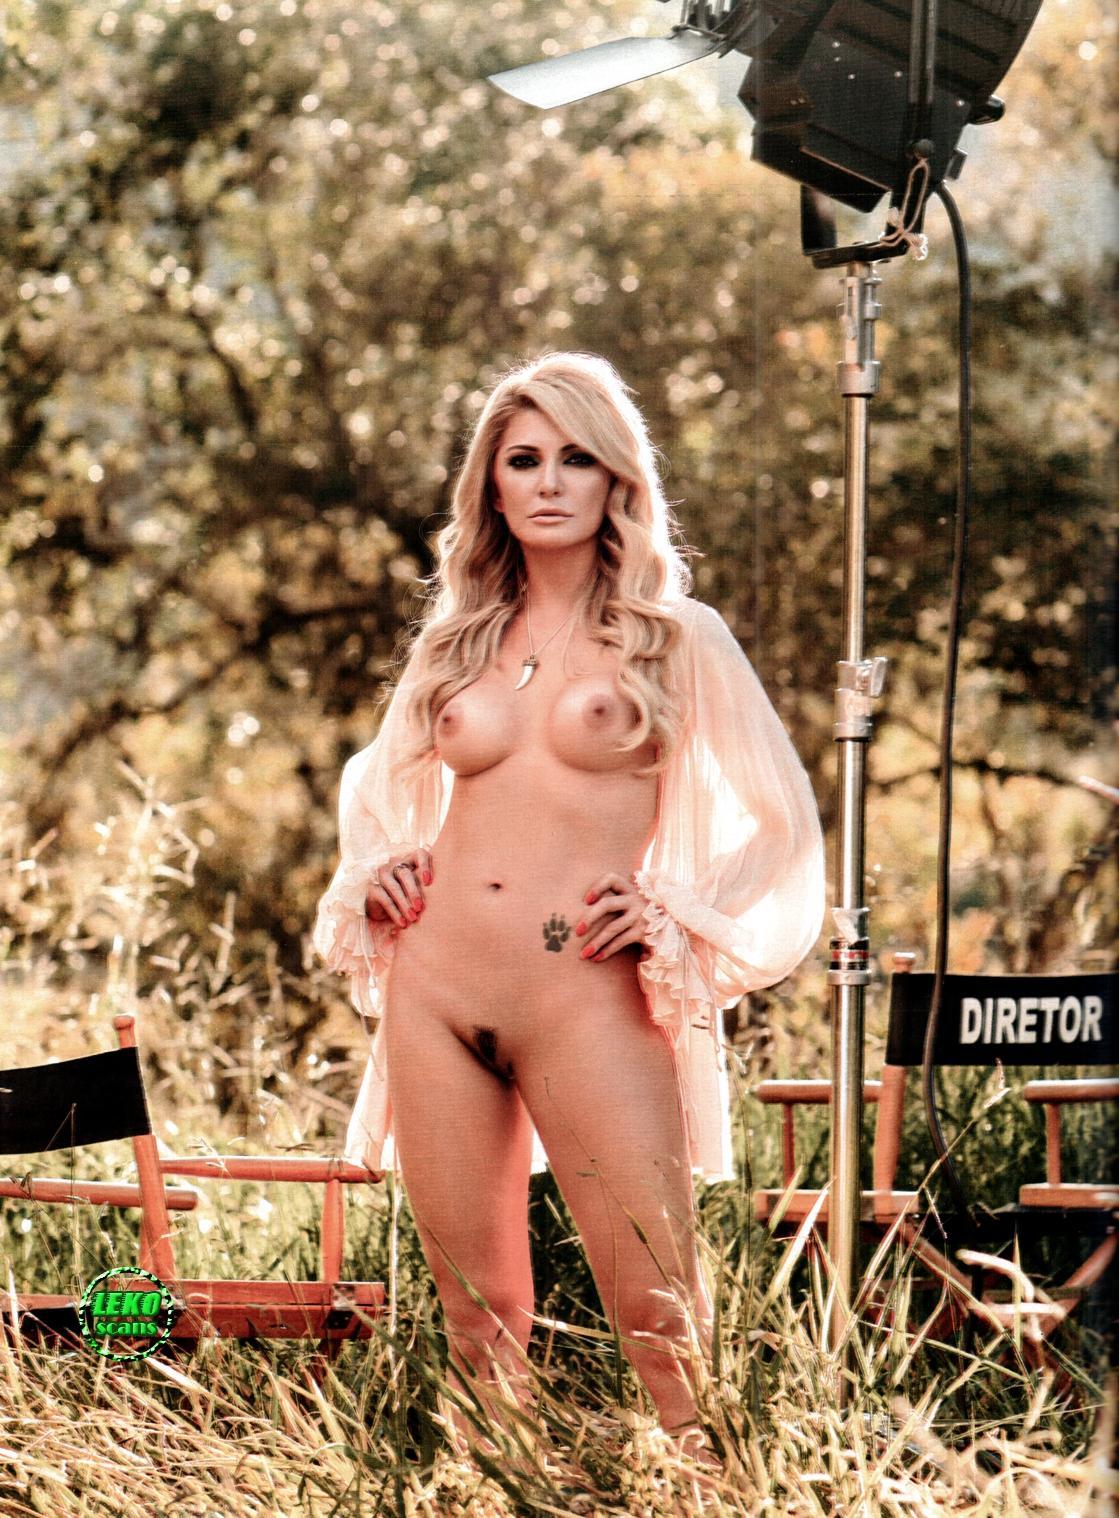 Antonia Fontenelle Revista Playboy Ef B Aa Df C A Faebcb